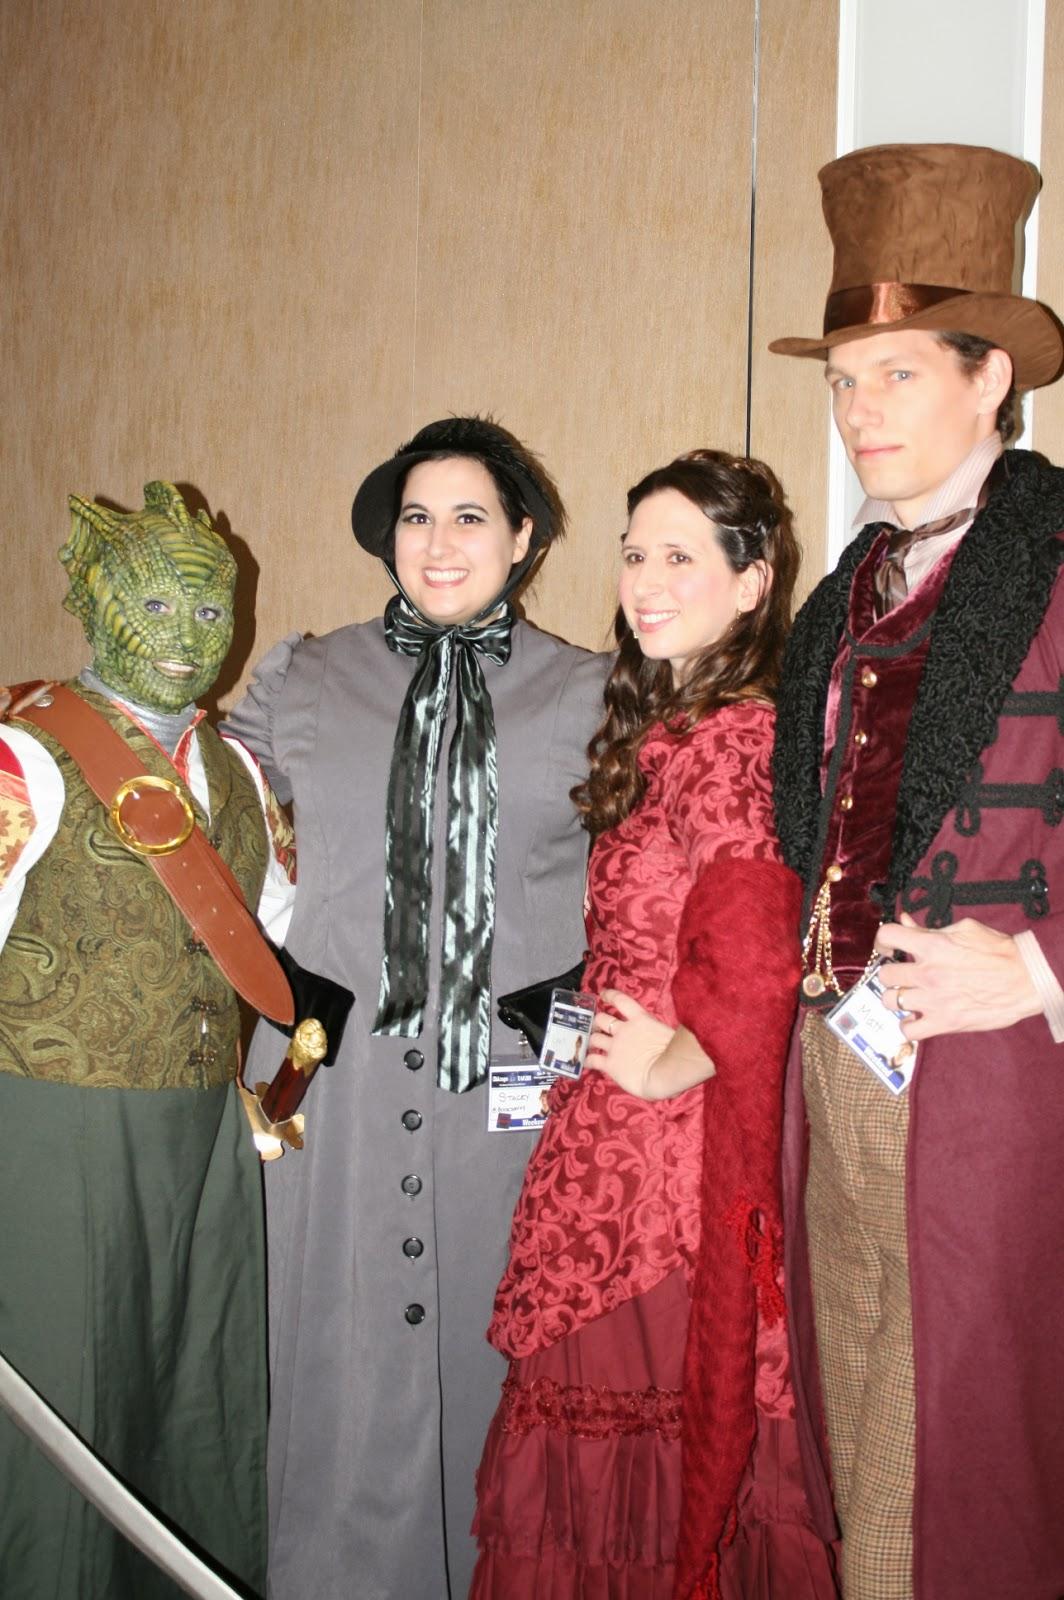 Vastra Jenny Clara Doctor  sc 1 st  The Casual Costumer & The Casual Costumer: Chicago TARDIS 2013